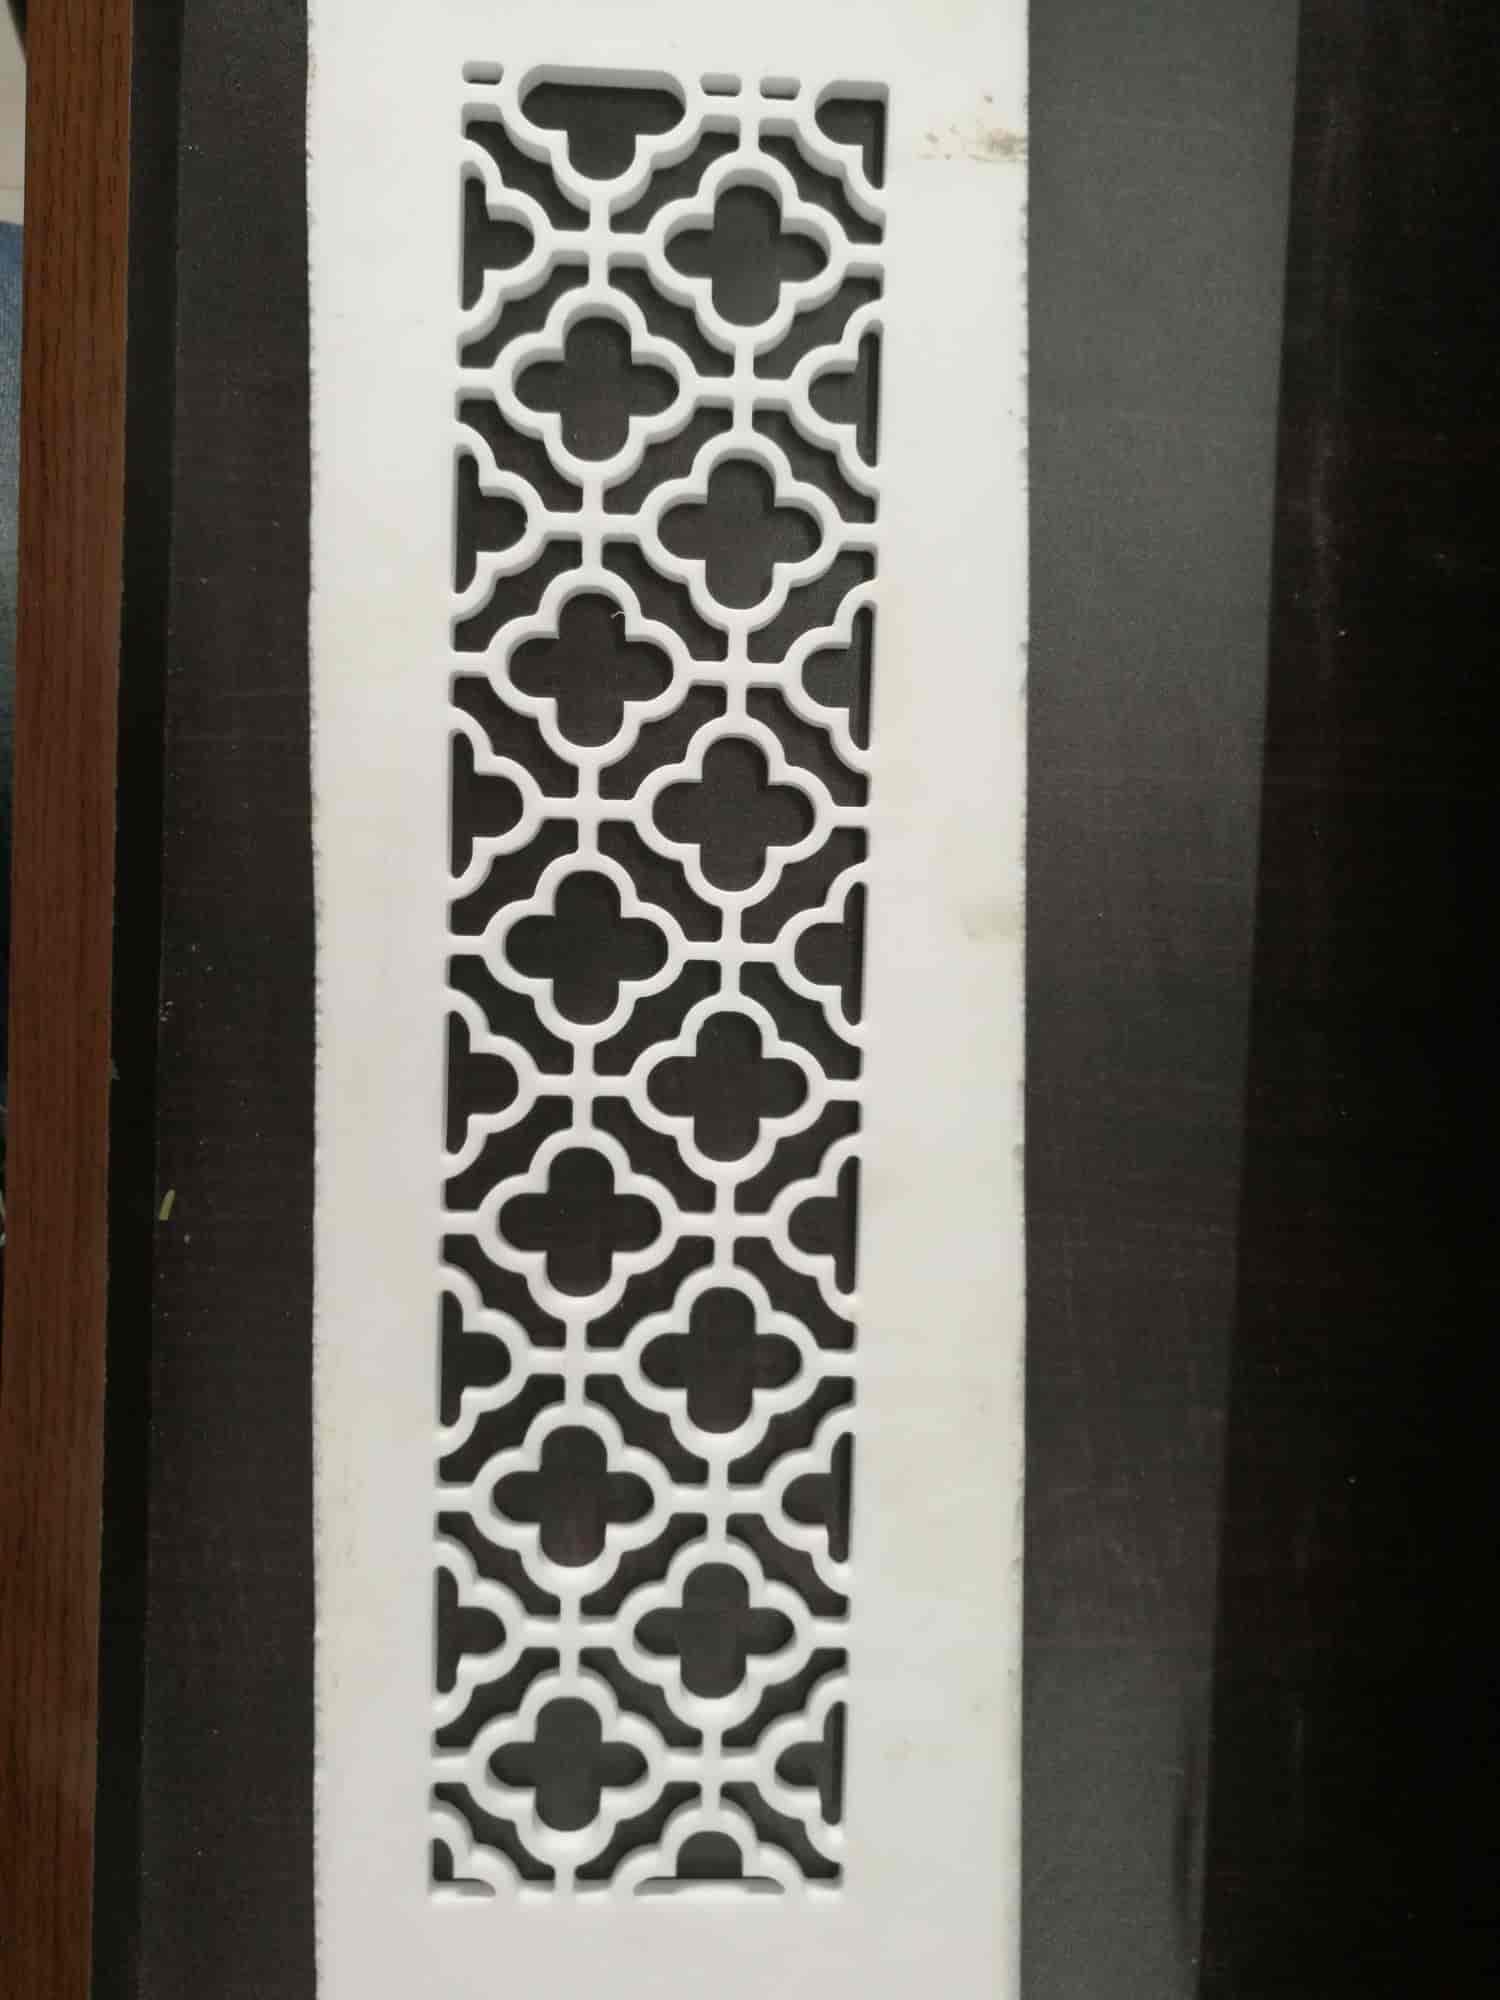 Sai Laser Tech, Kharghar Sector 10 - Acrylic Sheet Dealers